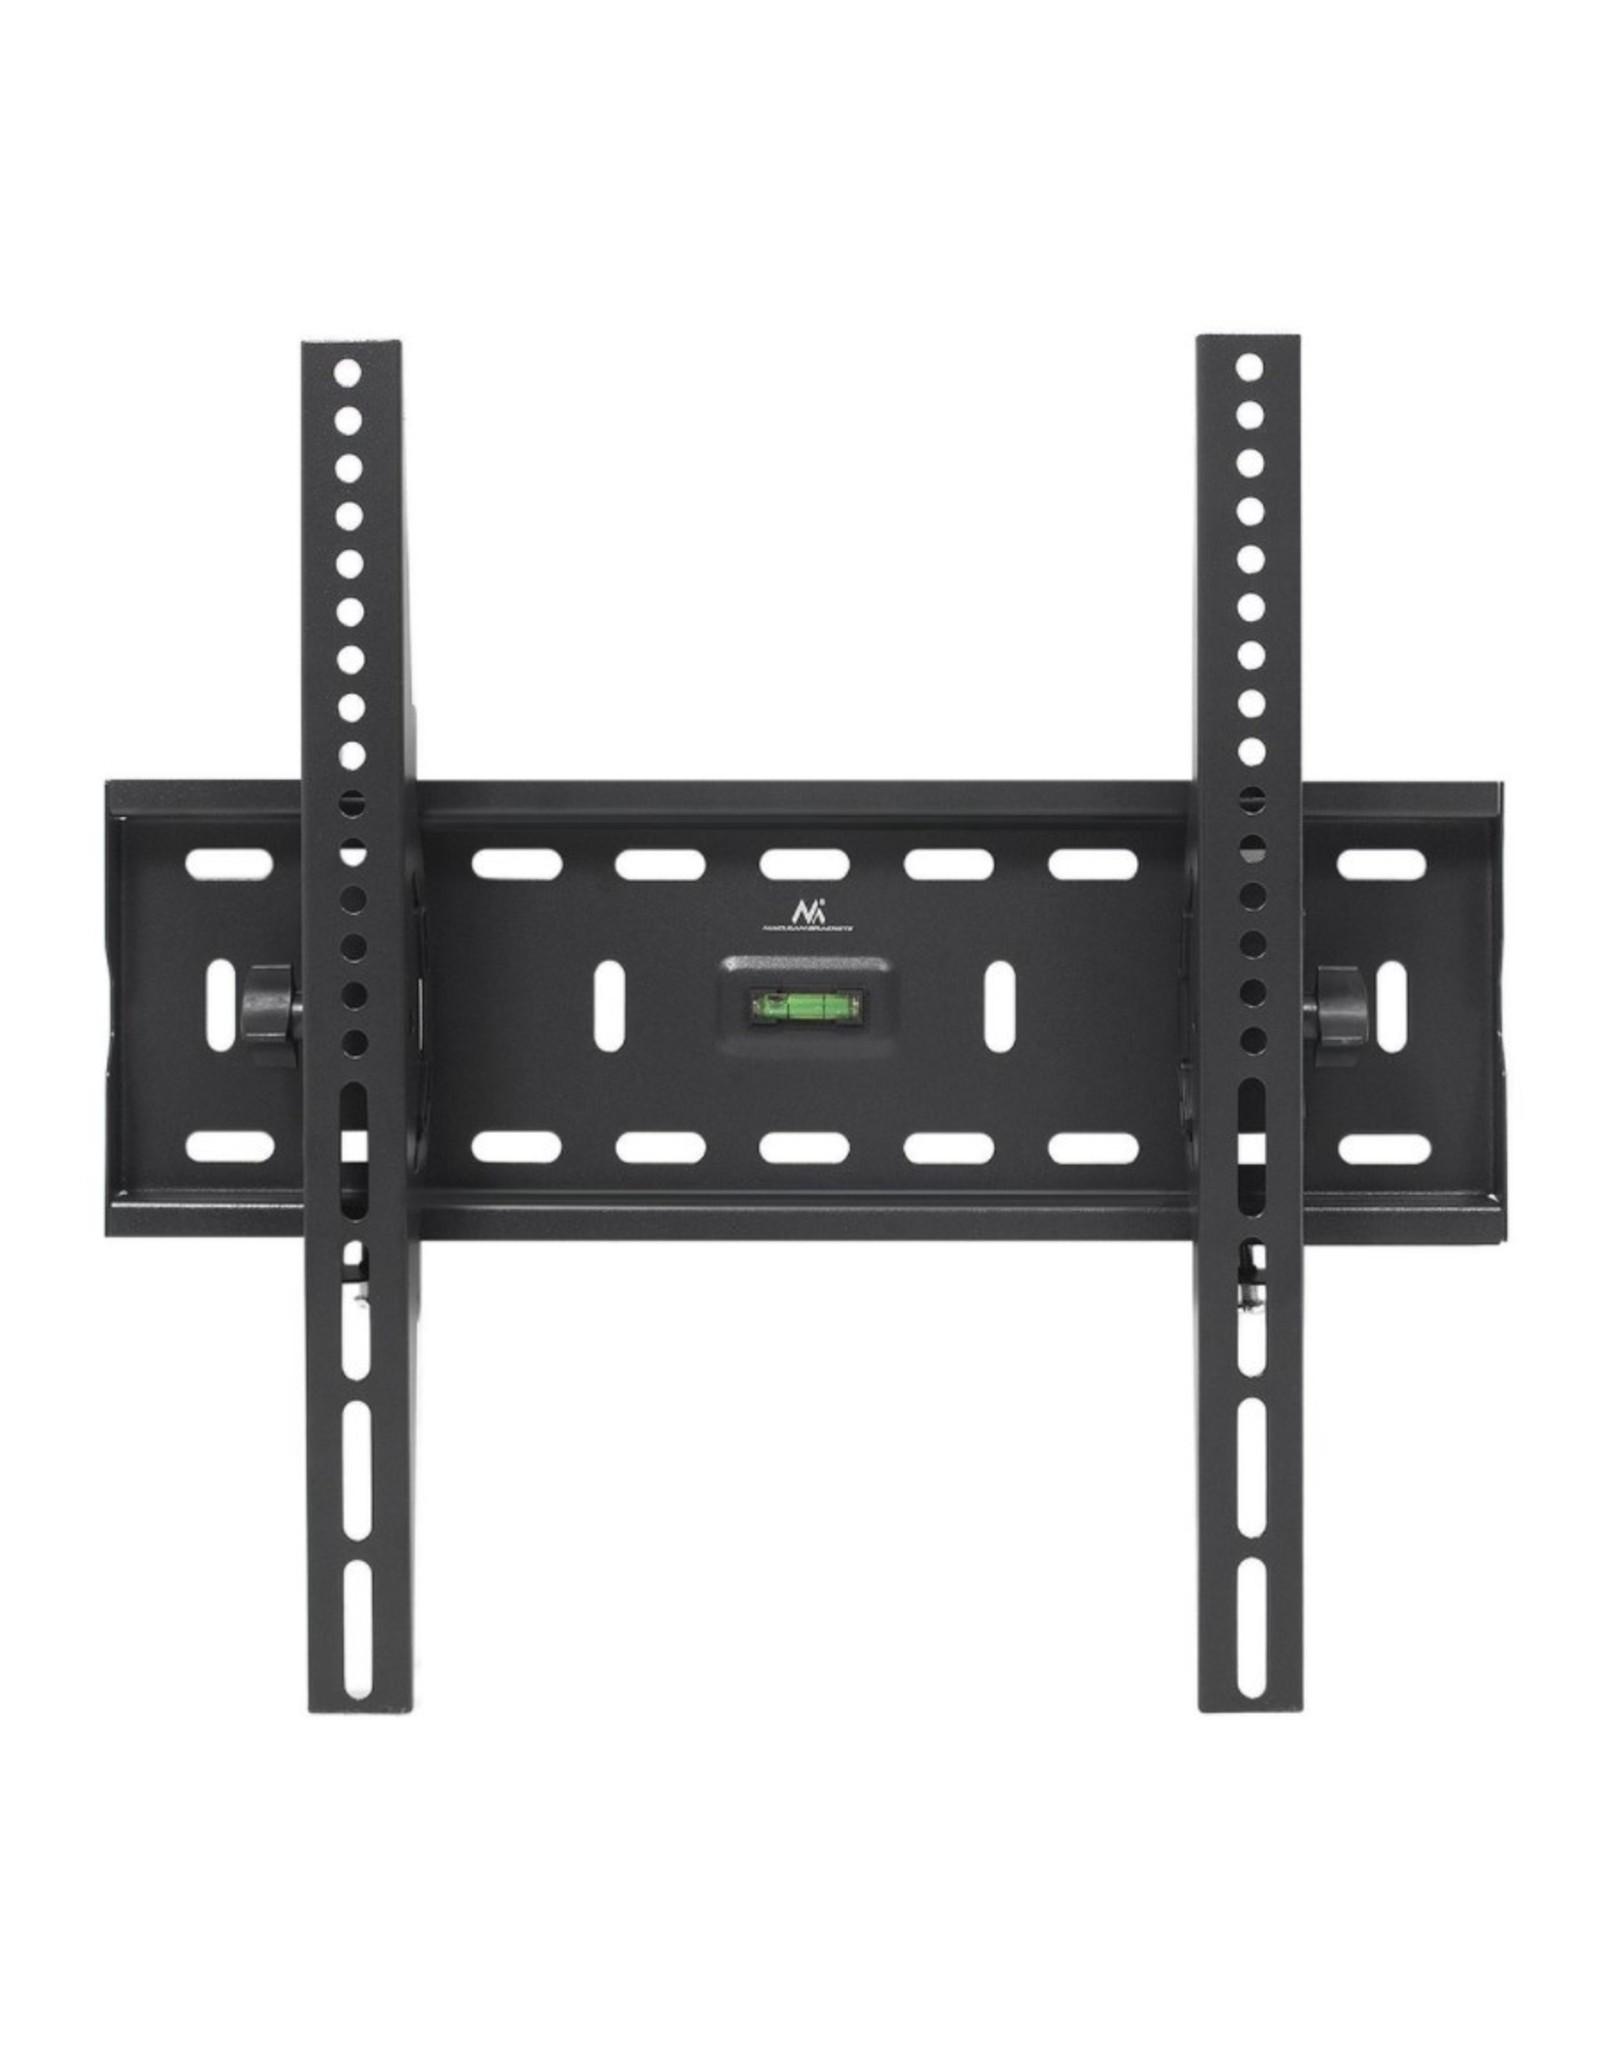 TV Muurbeugel wandsteun wandbeugel 26-55 inch max vesa 400x400 Maclean